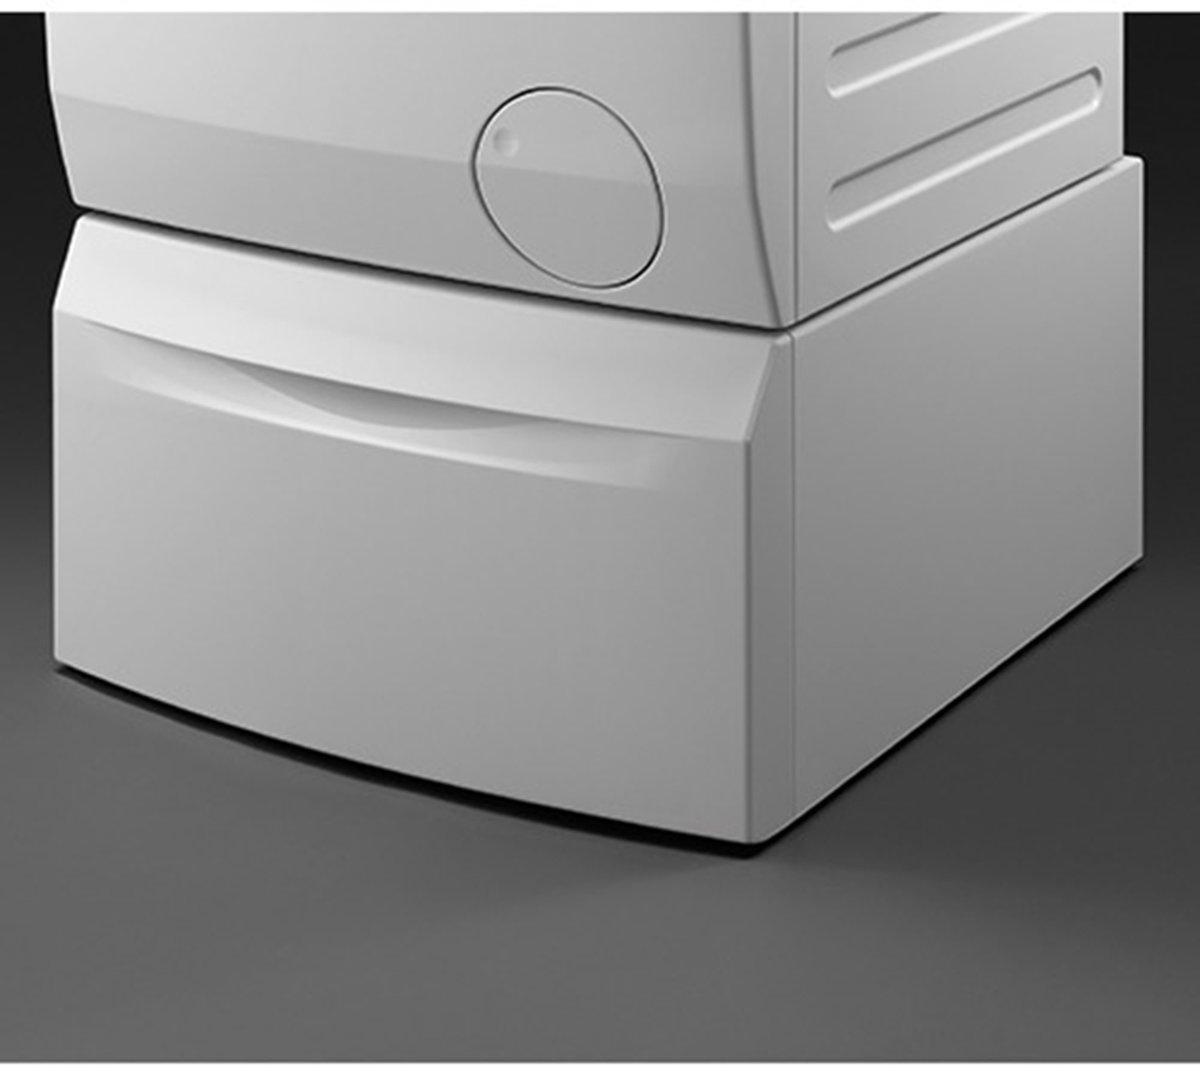 AEG E6WHPED2 - Wasmachine sokkel met lade kopen